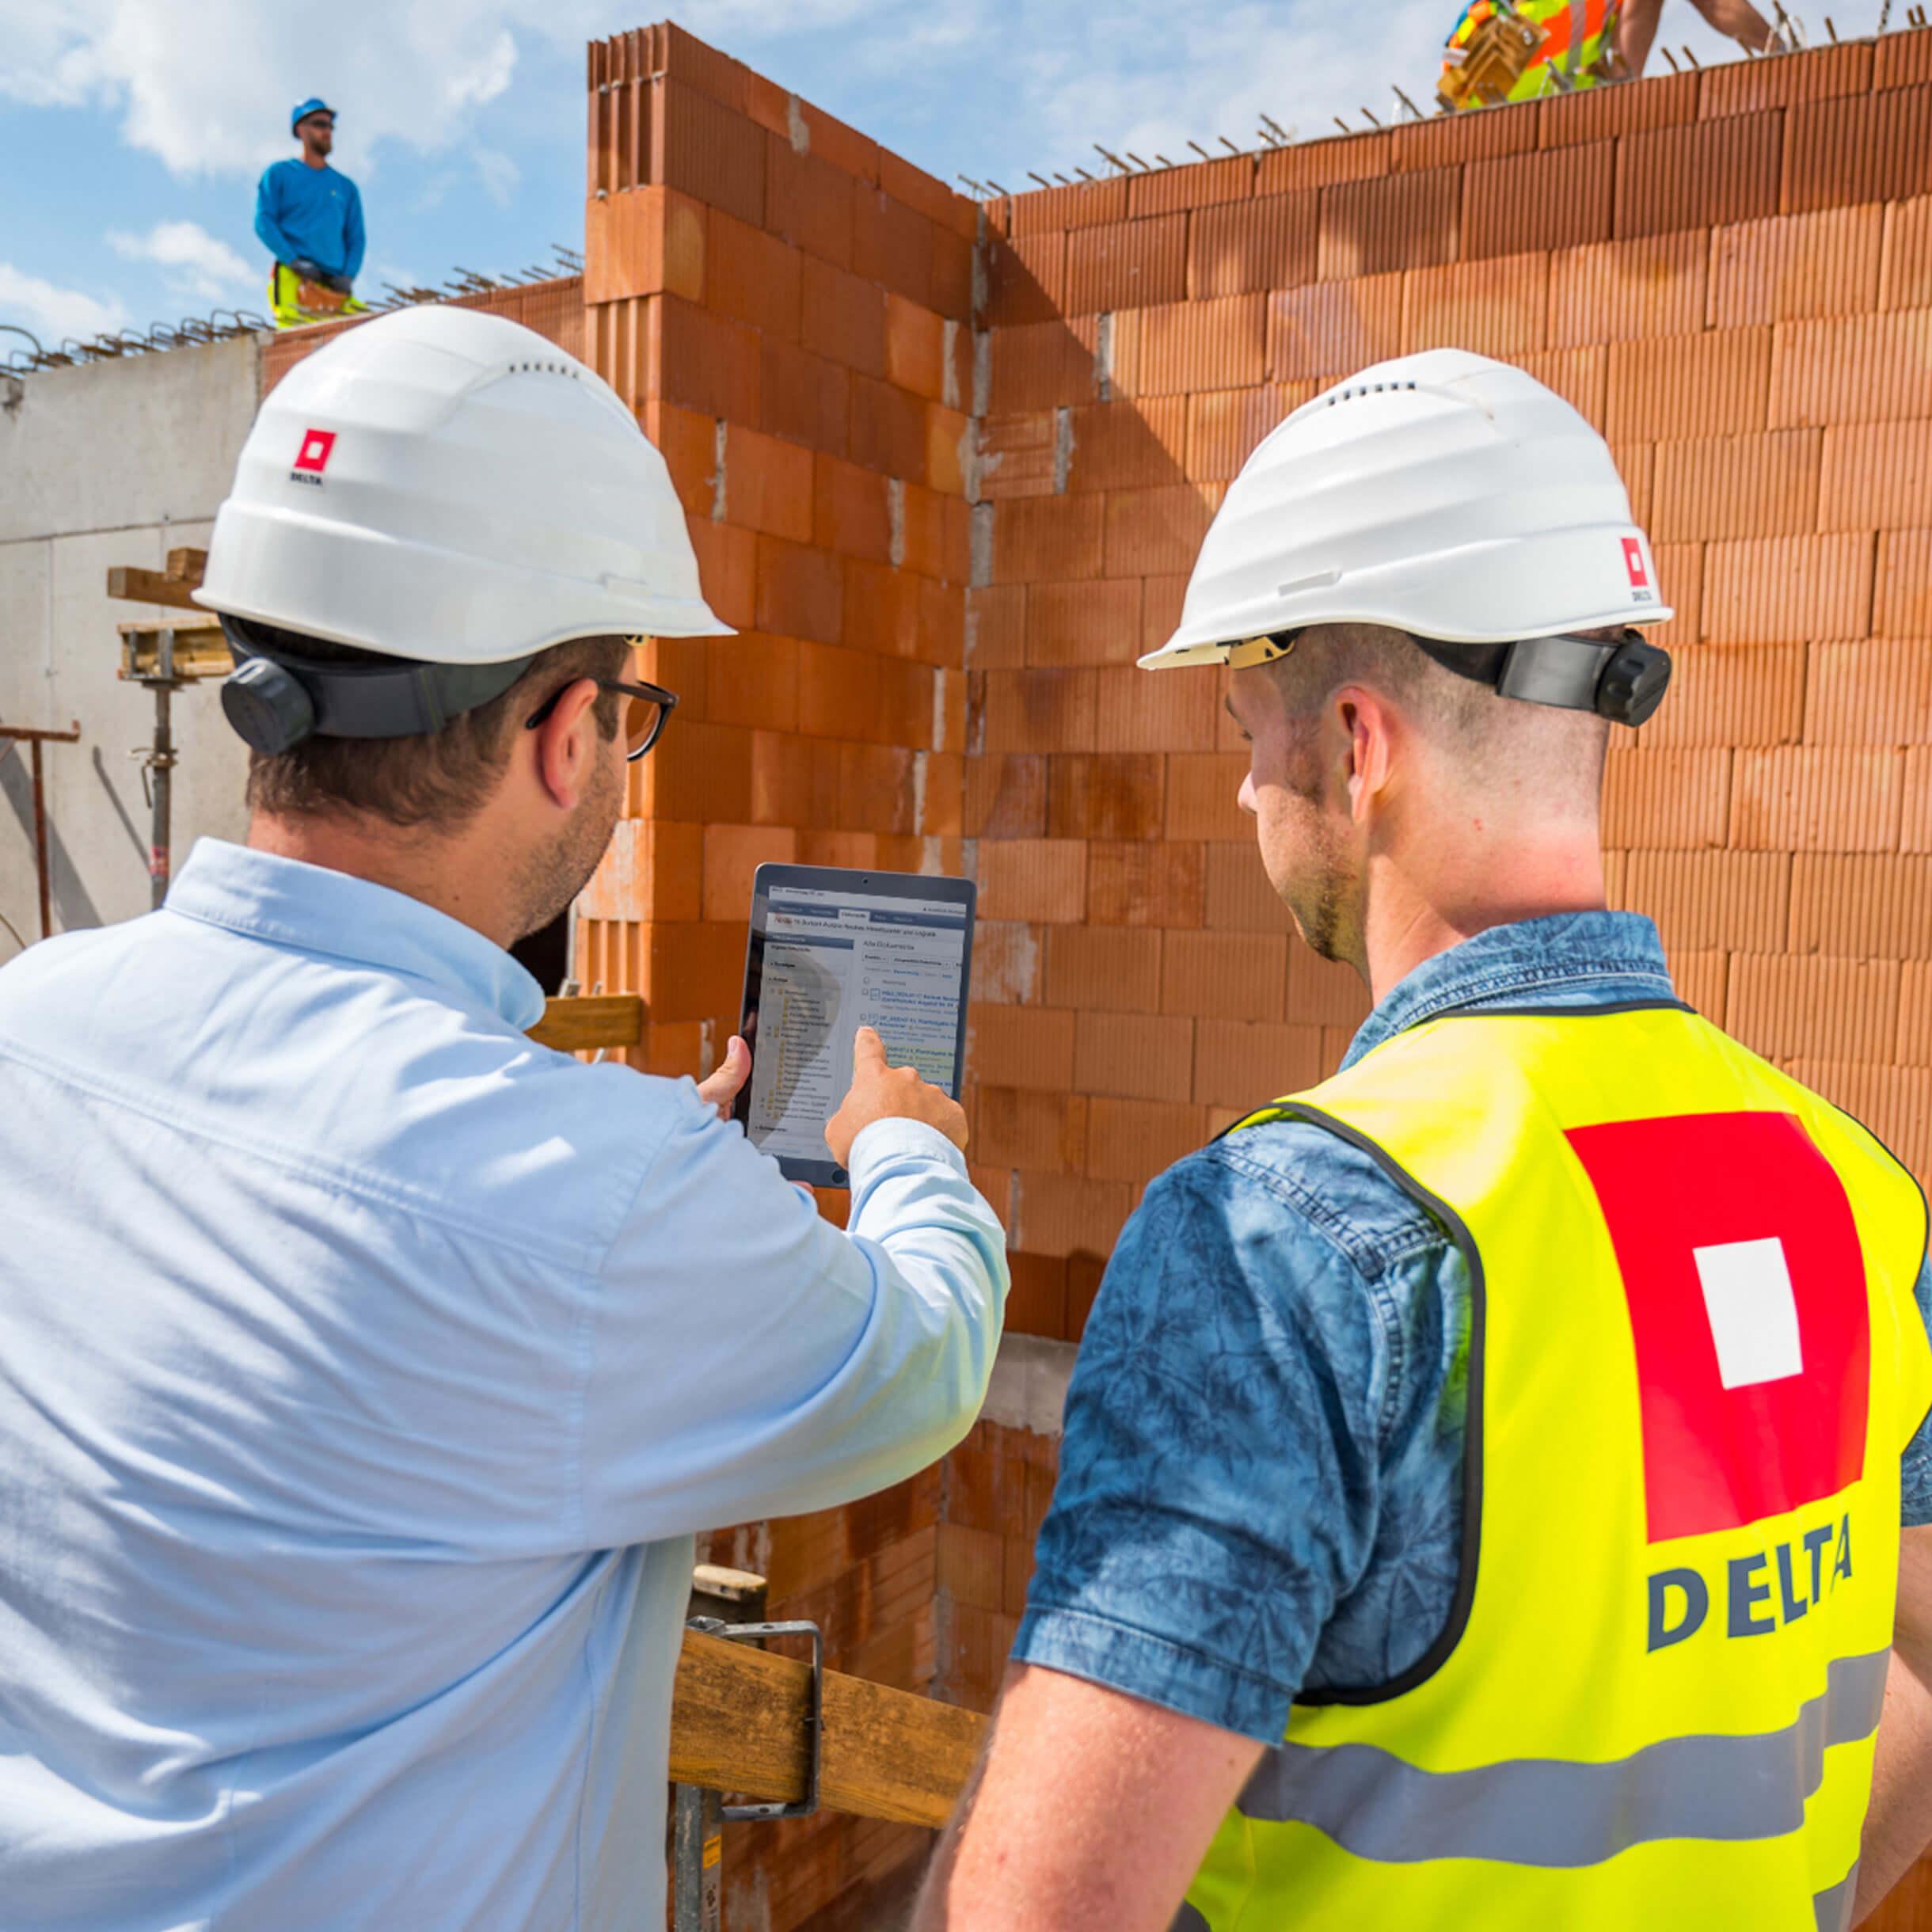 Baustelle-Datenpool auf Tablet